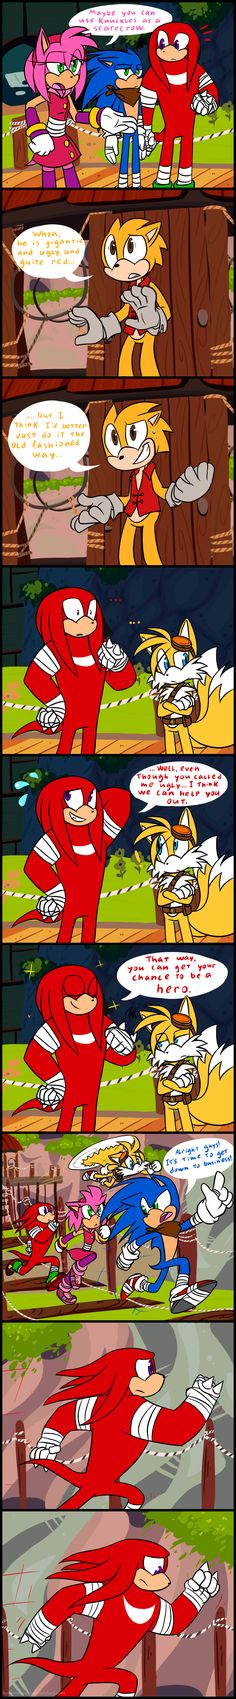 Sonic Boom: Leave Knuckles alone!!! by HoshiNoUsagi on DeviantArt